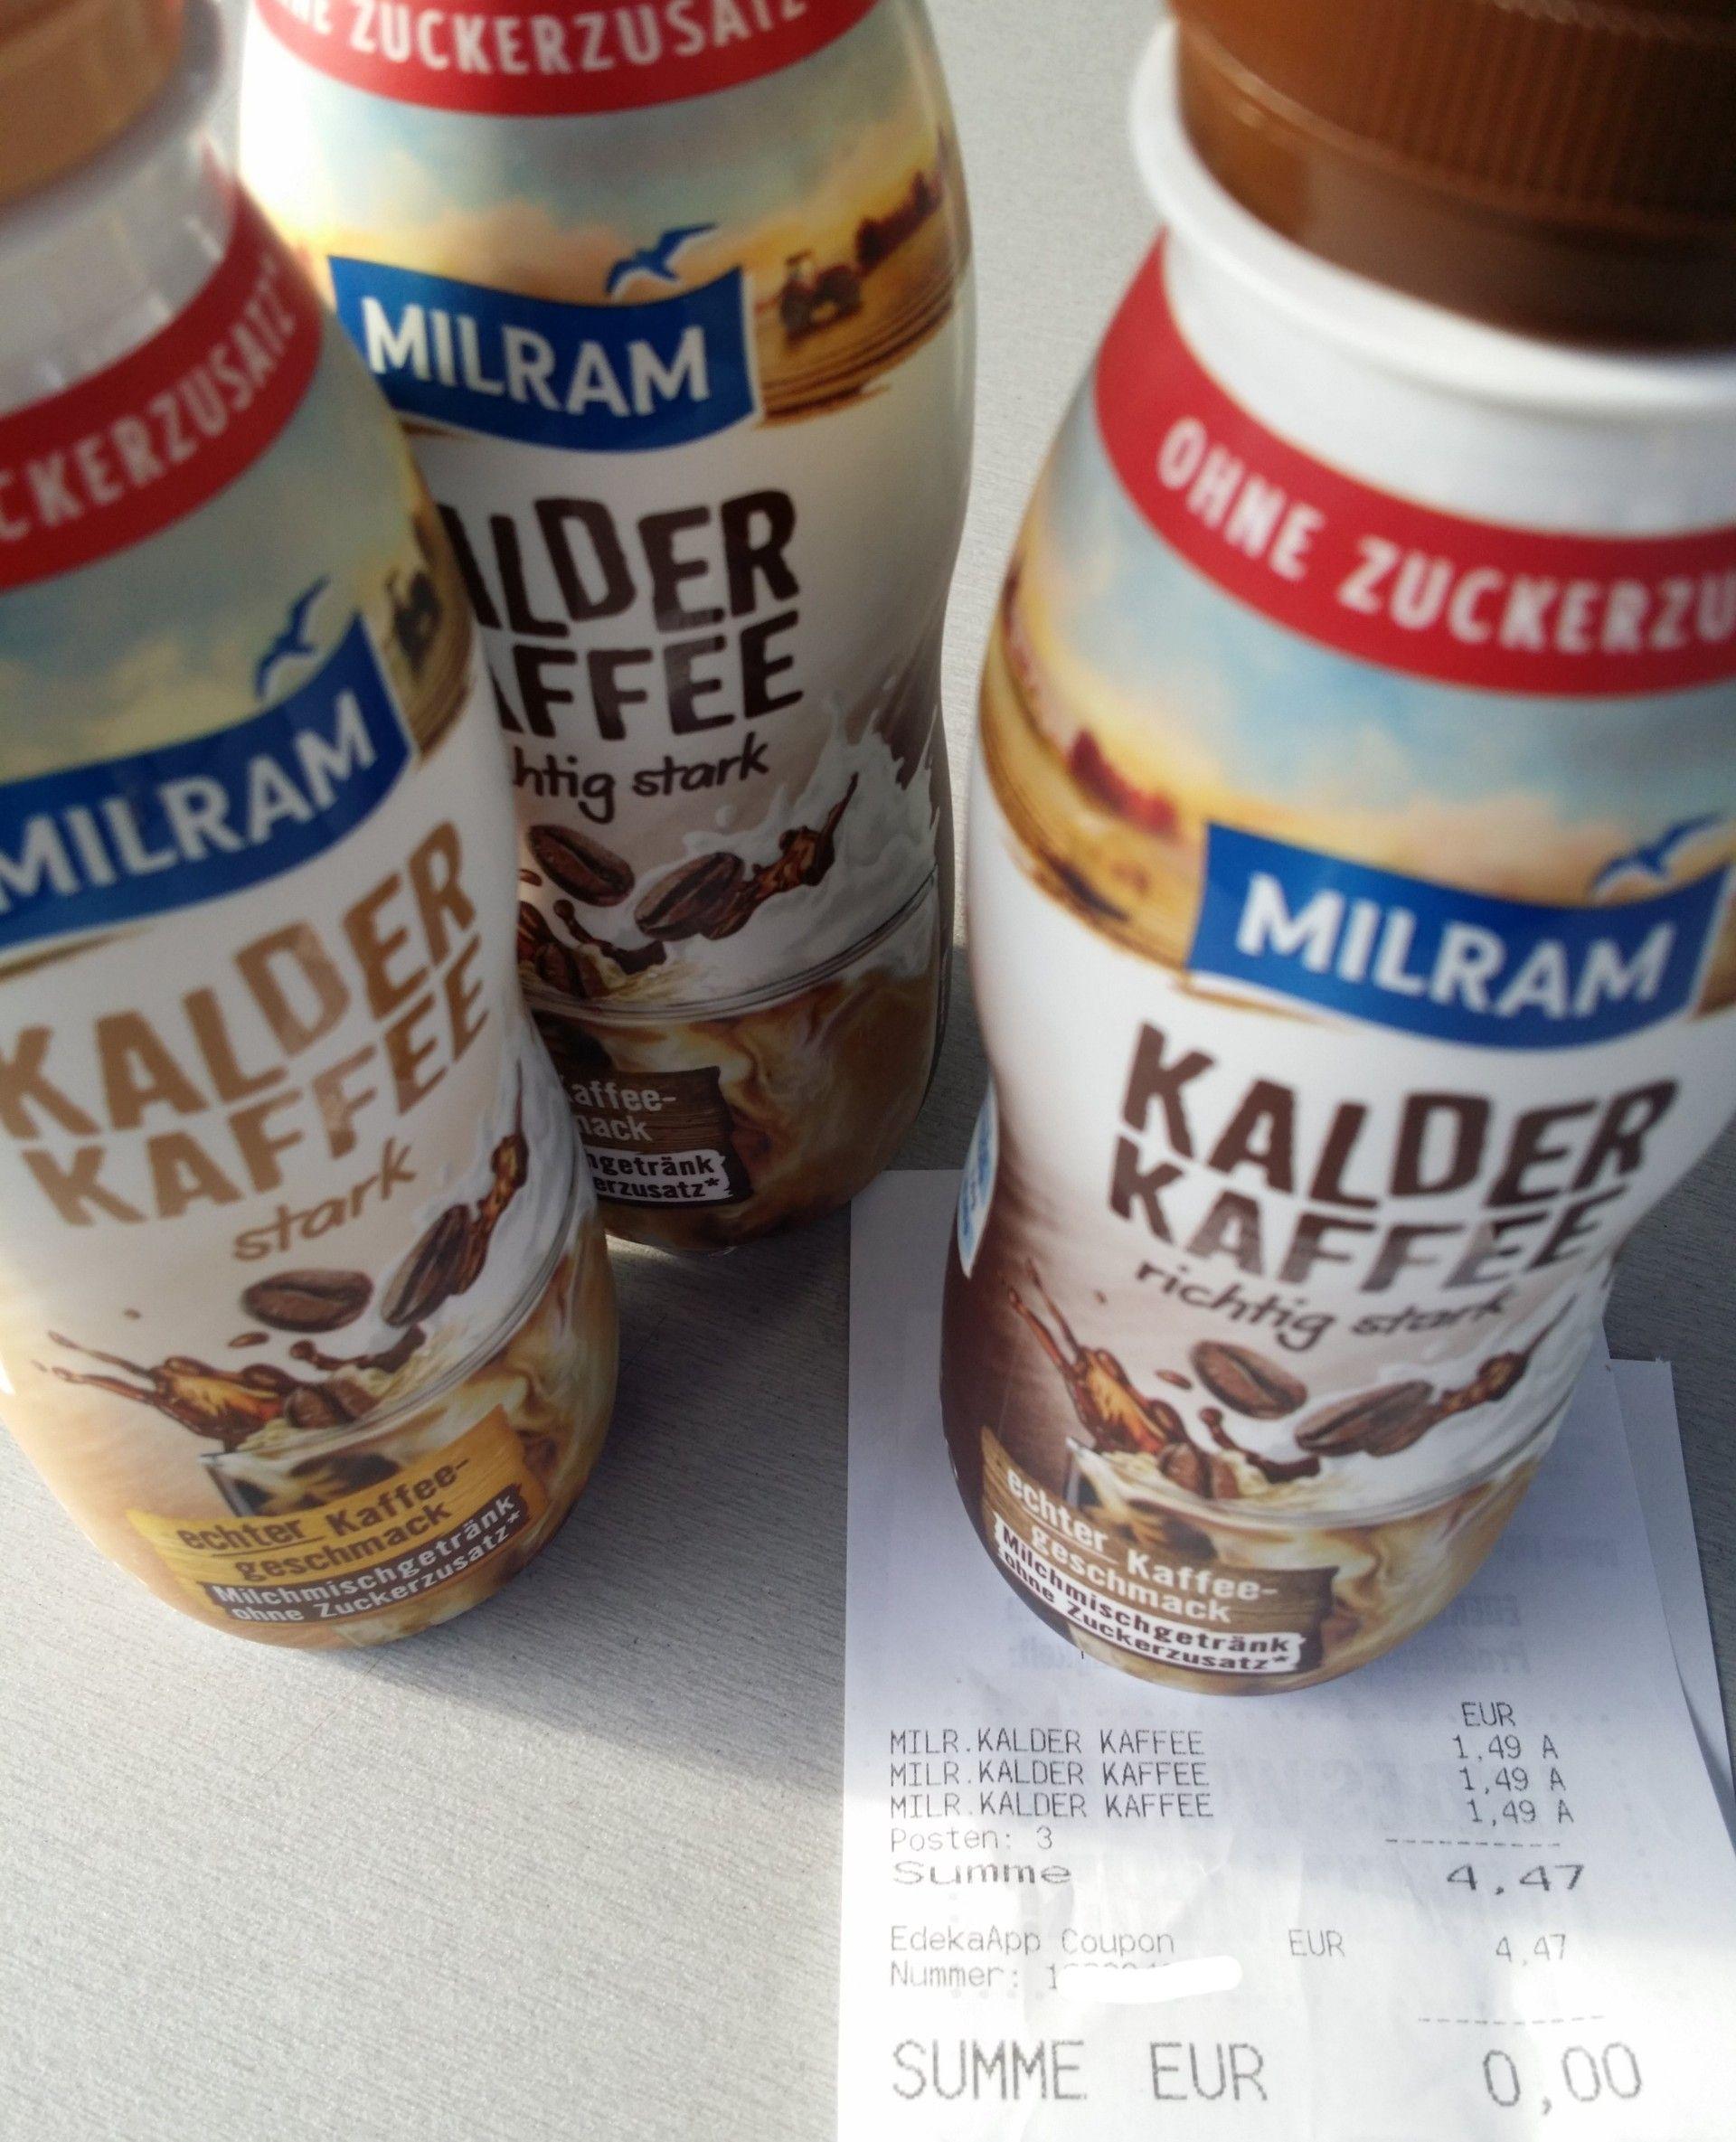 Milram Kalder Kaffee endlos Freebie durch xfach Coupon in Edeka App [ggf. lokal]